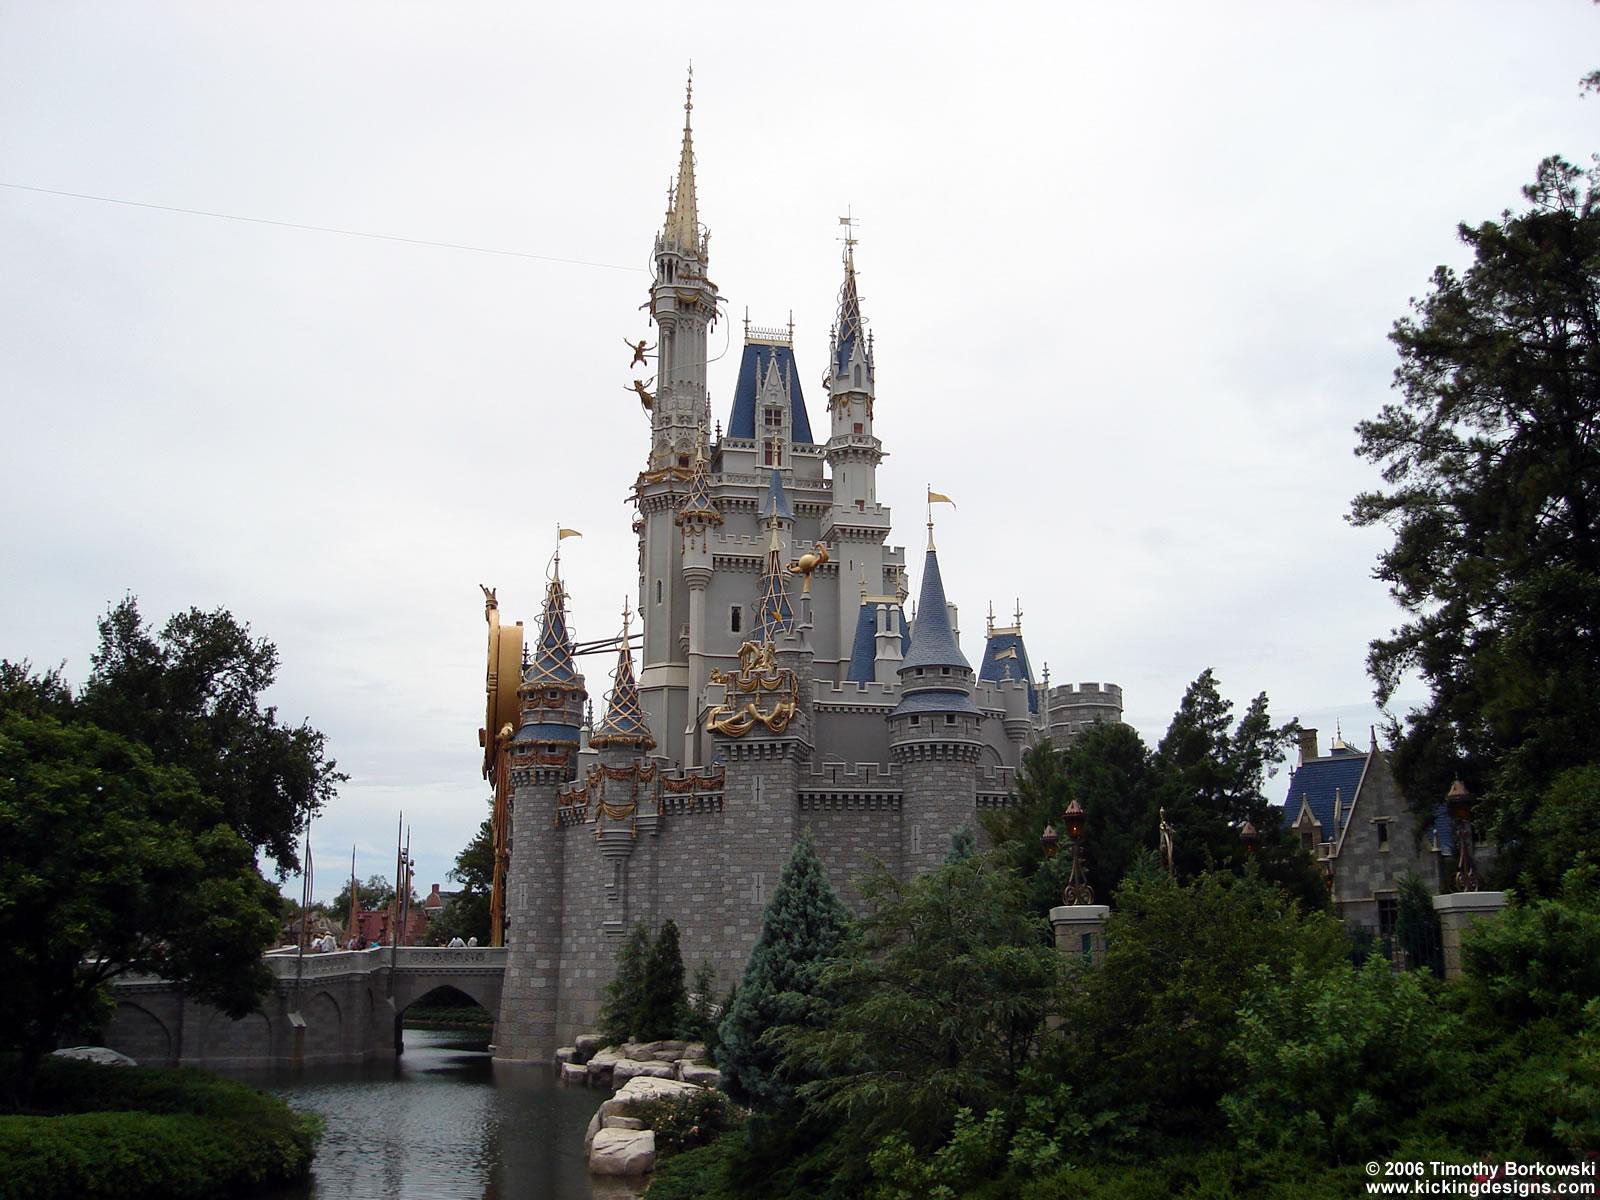 magic kingdom 05 magic kingdom 04 magic kingdom 03 magic kingdom 02 1600x1200